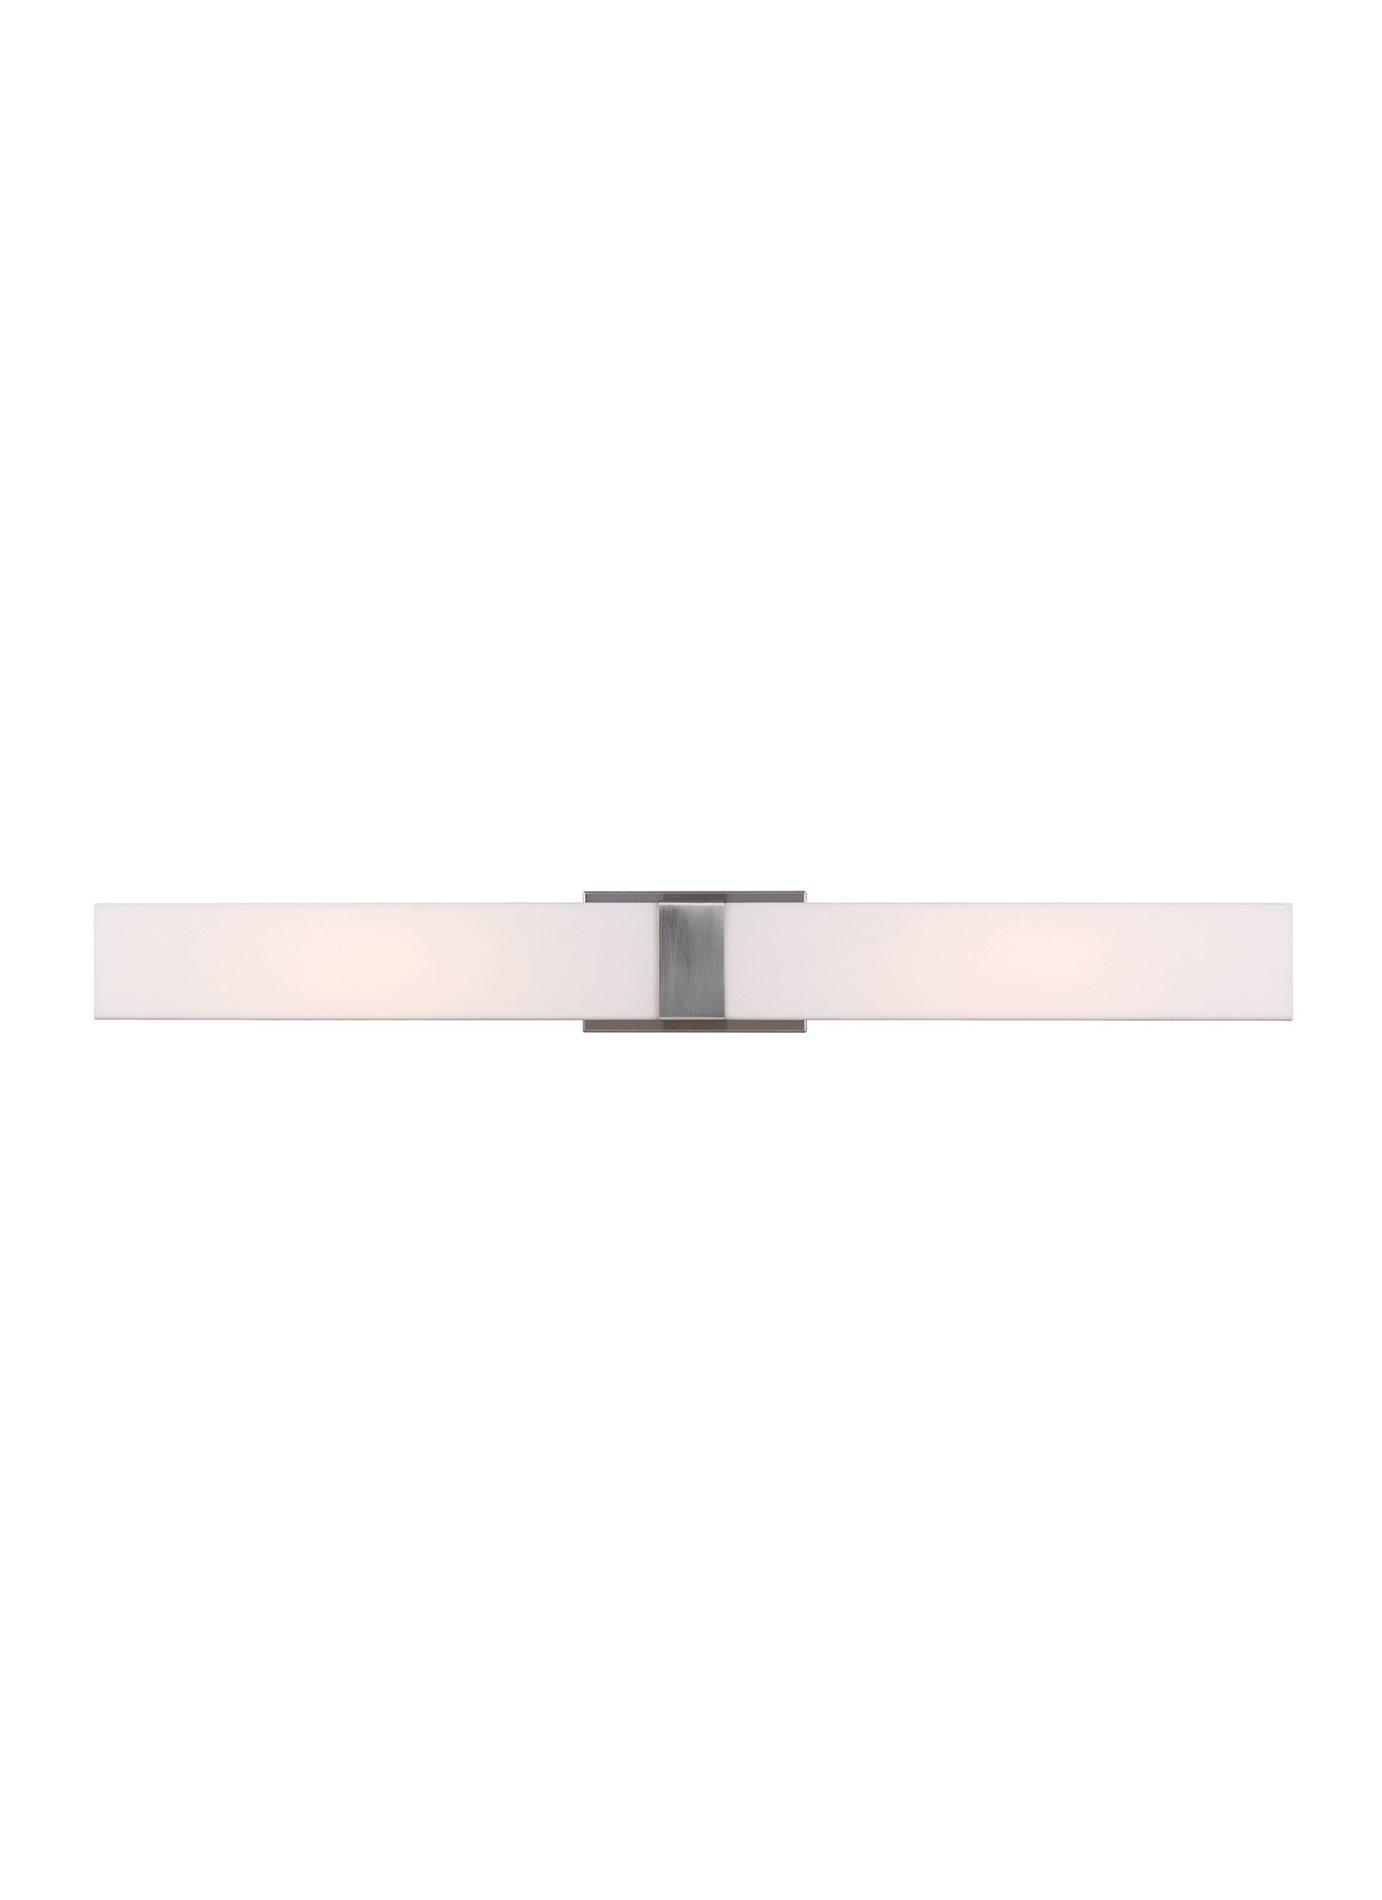 Sea Gull Lighting 4522991S 962 Vandeventer LED Modern Contemporary Bathroom